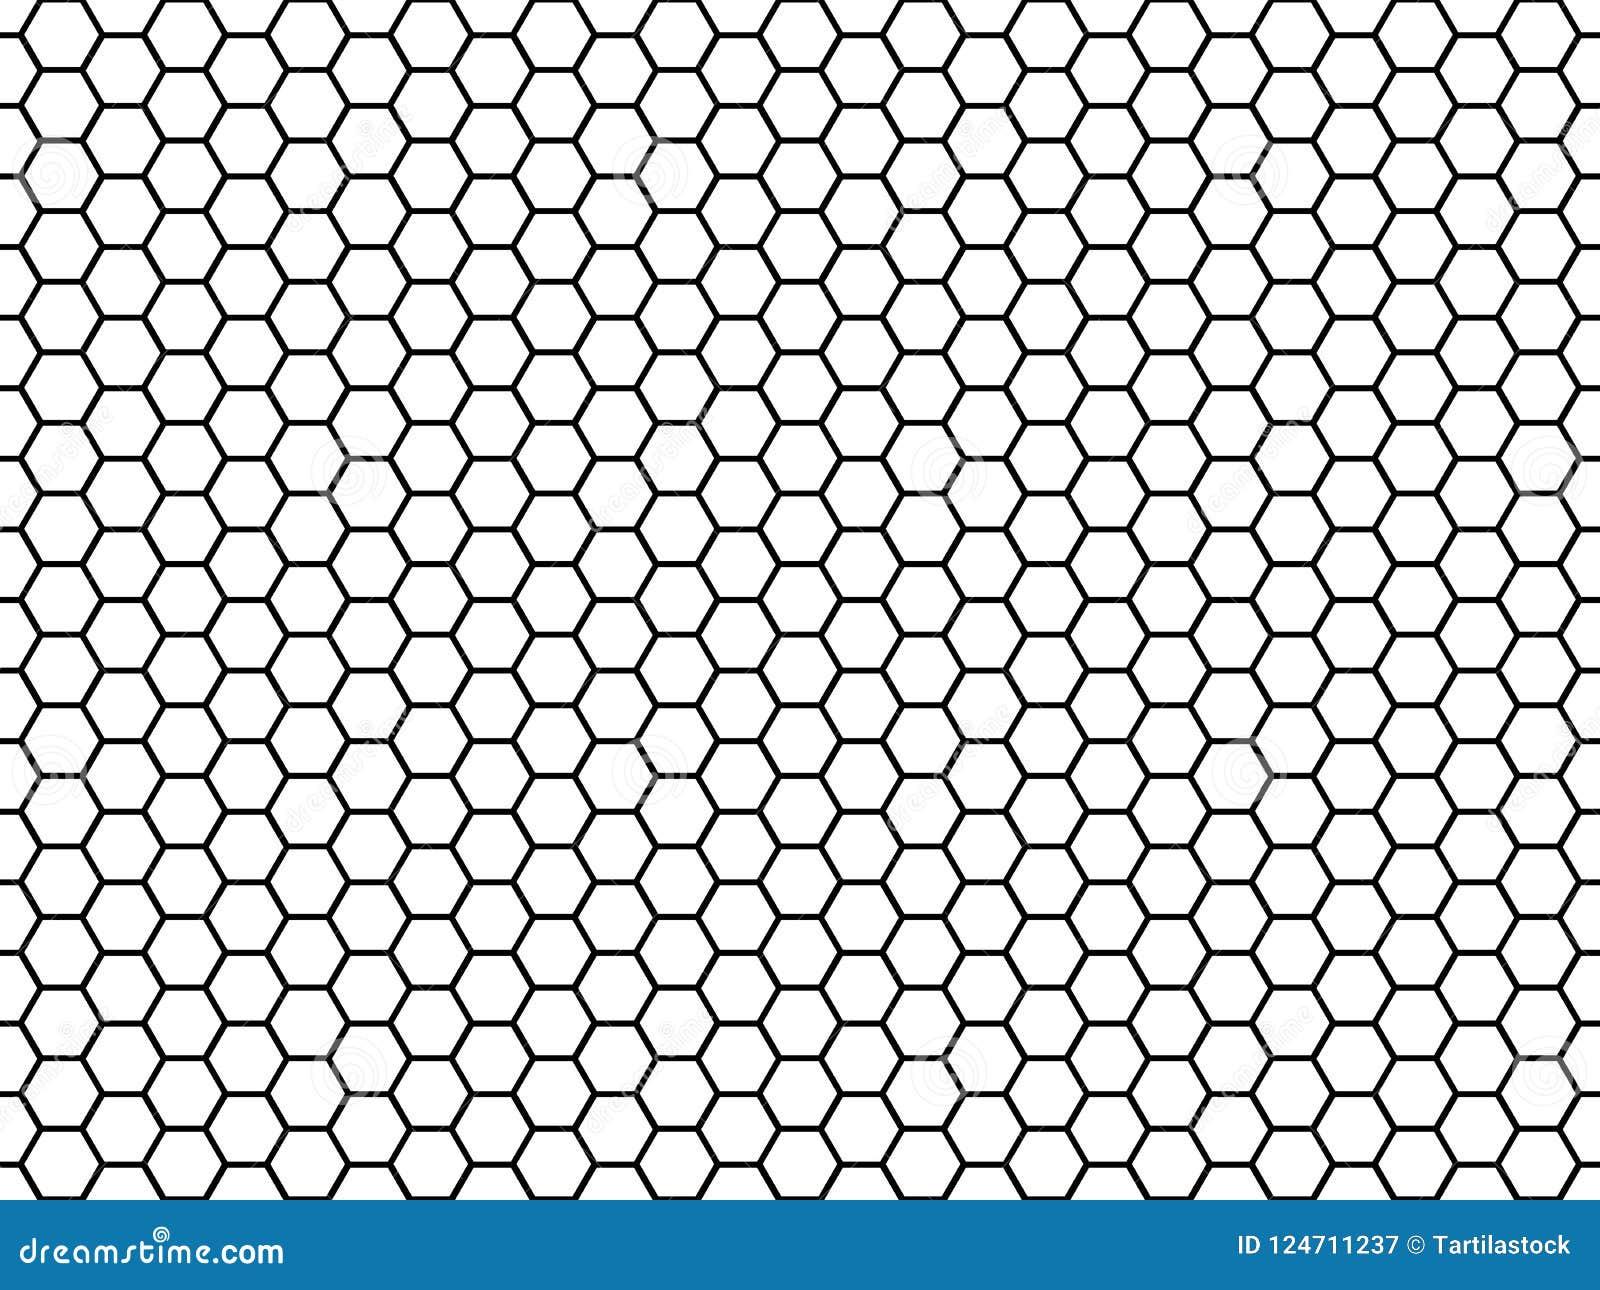 Hexagonal cell texture. Honey hexagon cells, honeyed comb grid texture and honeycombs fabric seamless pattern vector